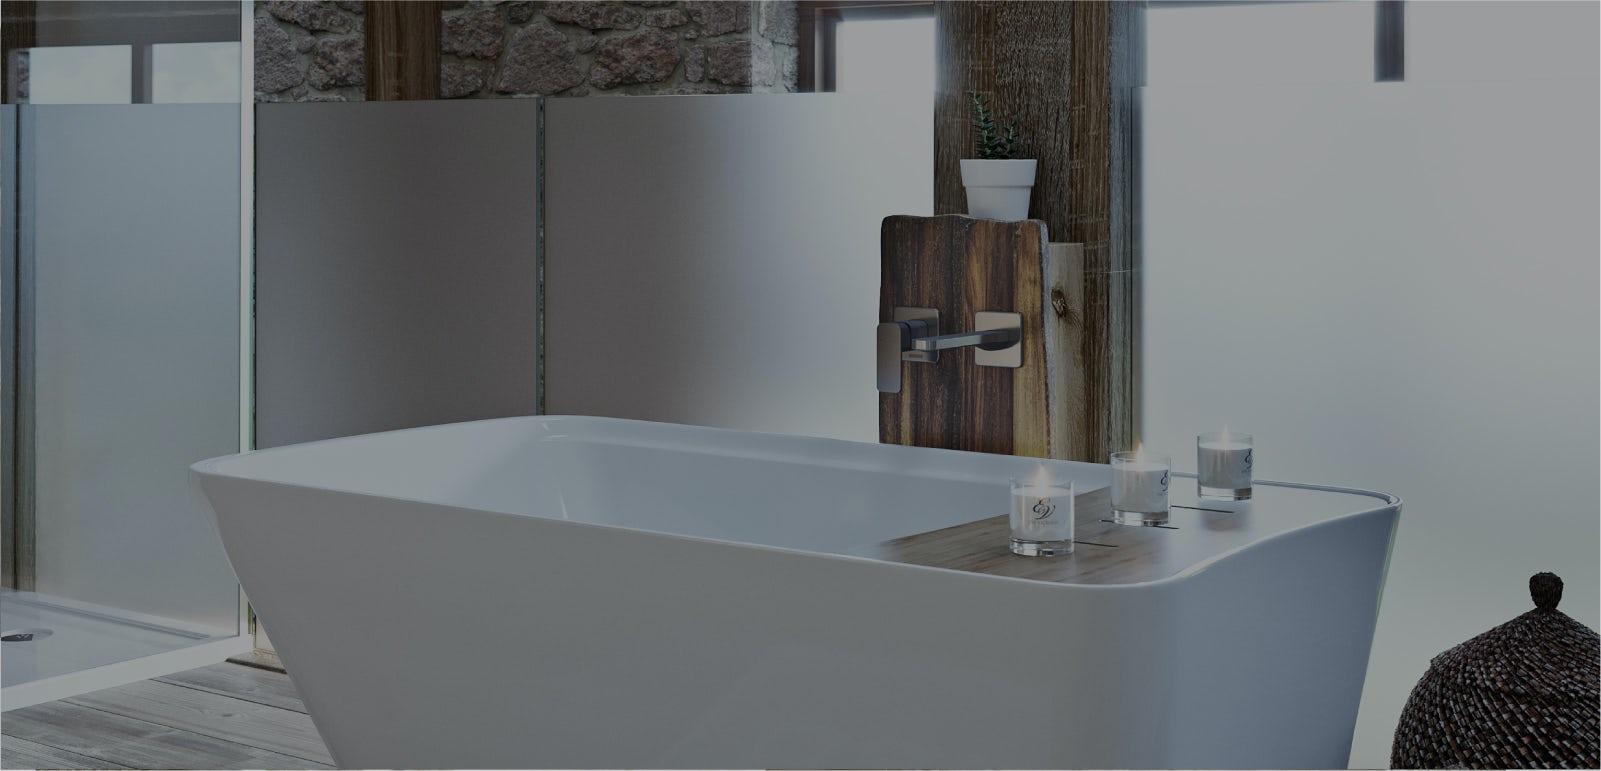 Bathroom ideas: Refined Rustic part 3